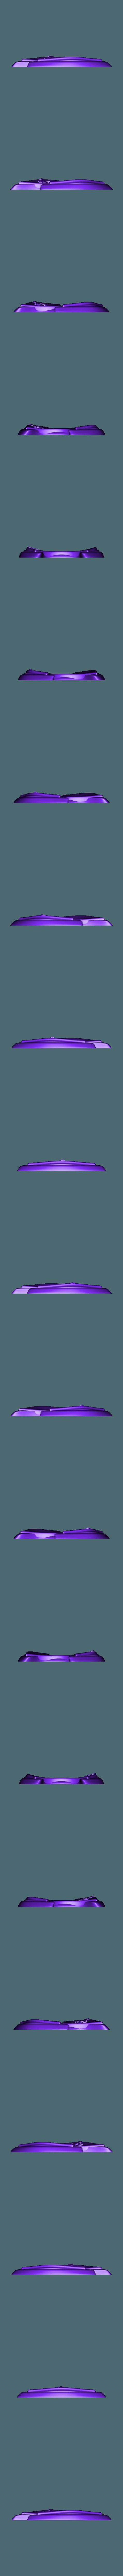 dreadnought11mm-body1.stl Download free STL file Dreadnought Fidget Spinner • 3D print object, ProteanMan